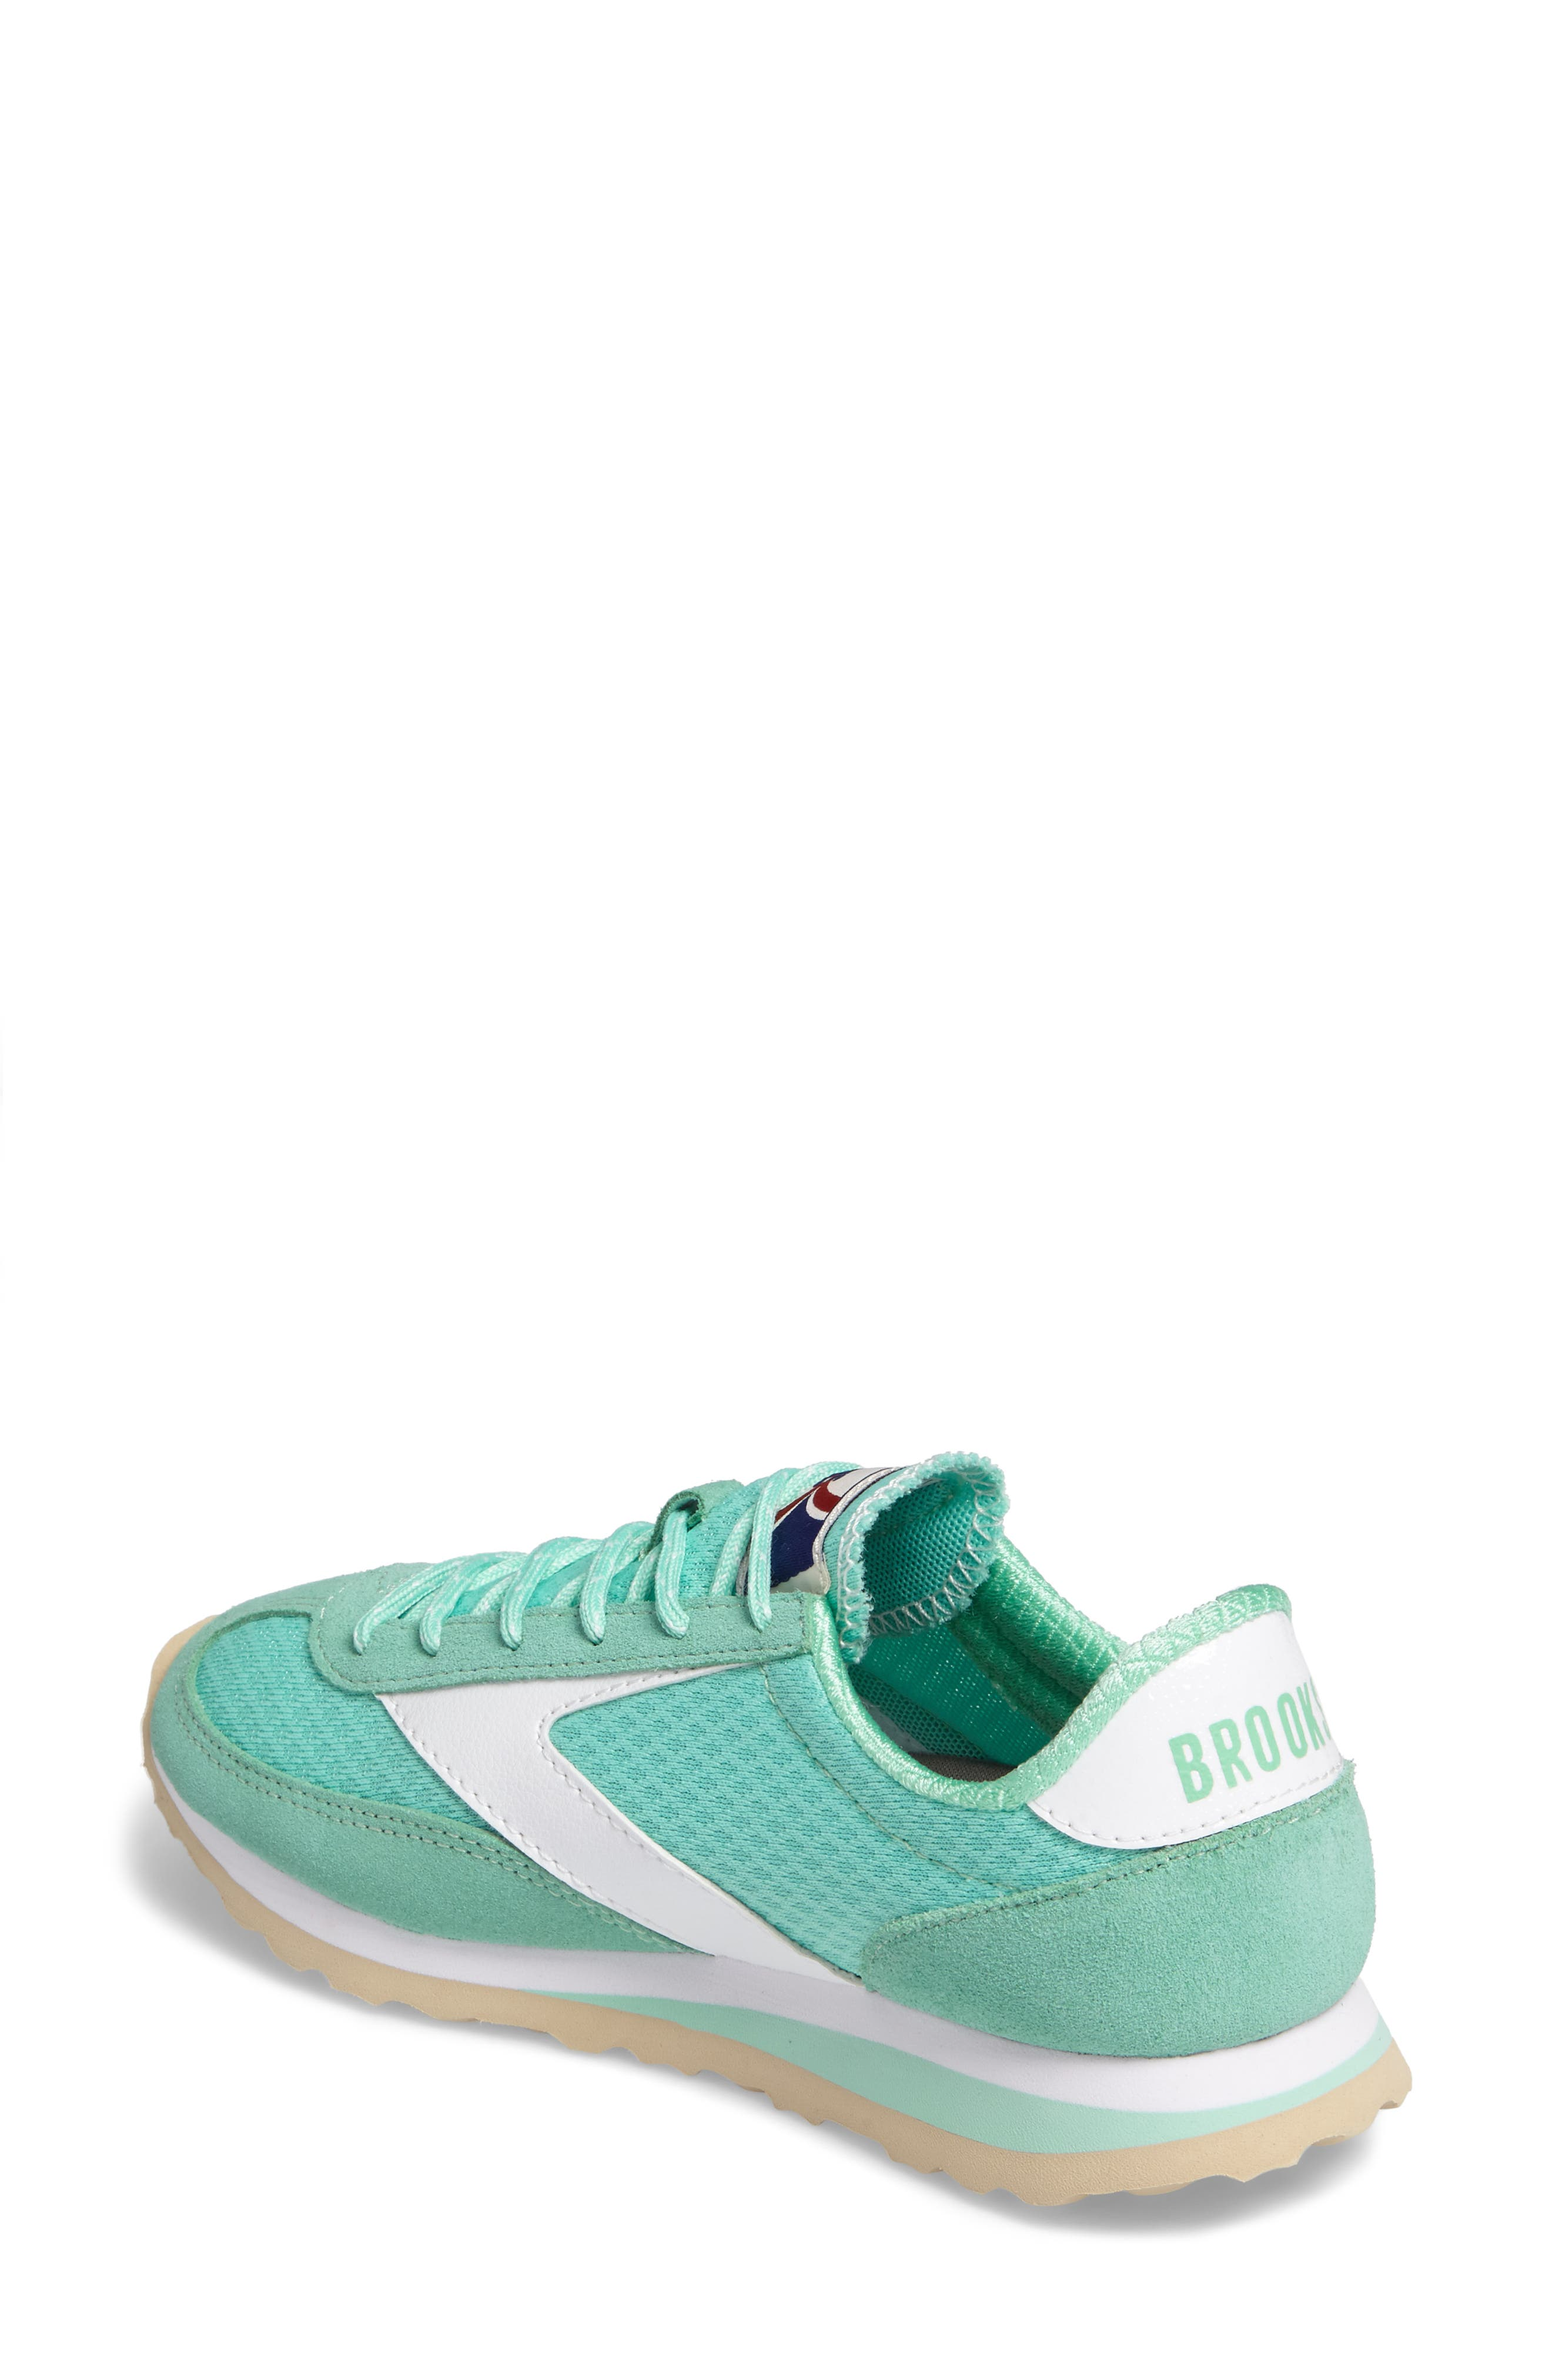 'Vanguard' Sneaker,                             Alternate thumbnail 2, color,                             024